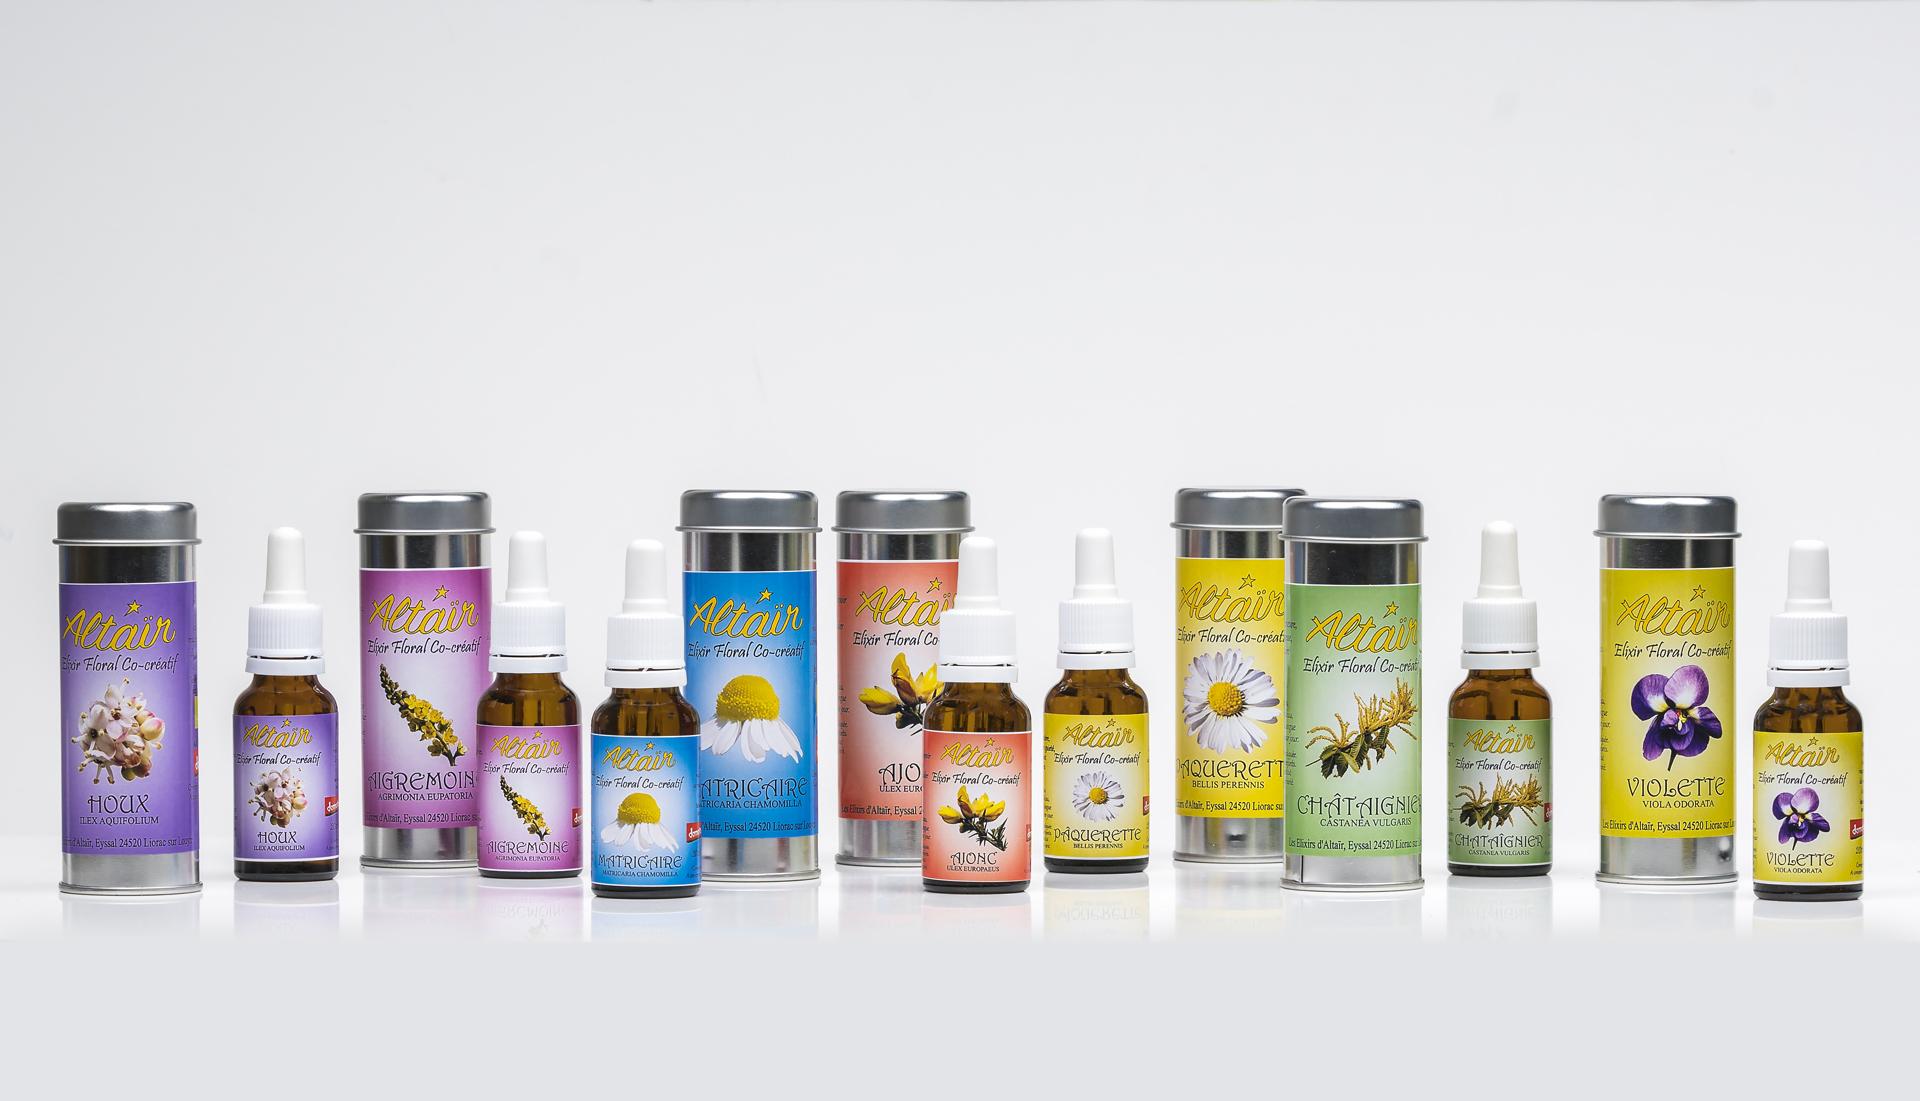 elixir-floraux-altair-périgord